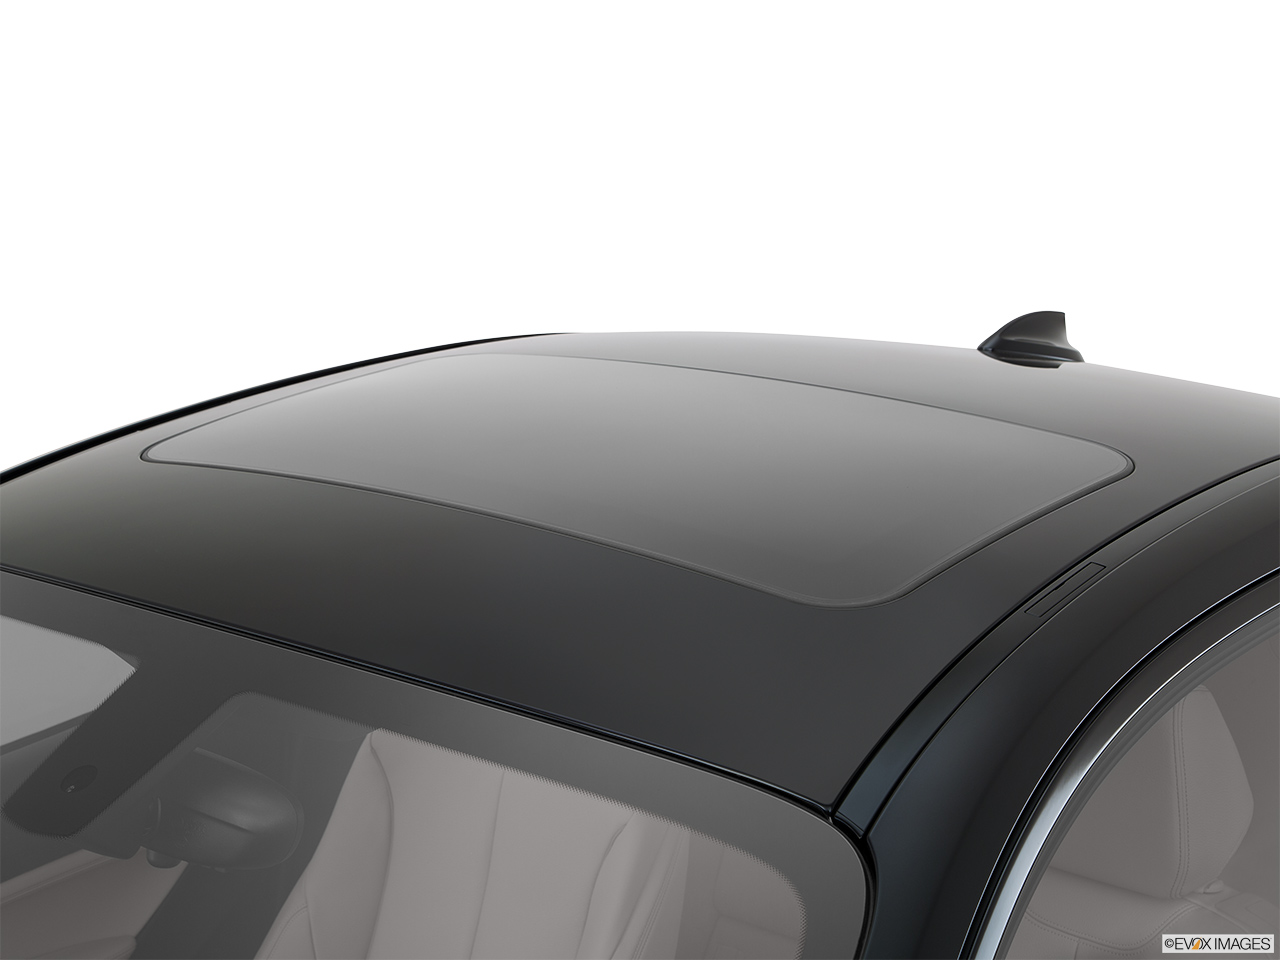 2015 Bmw 2 Series Coupe 228i Xdrive Awd Sunroof Moonroof